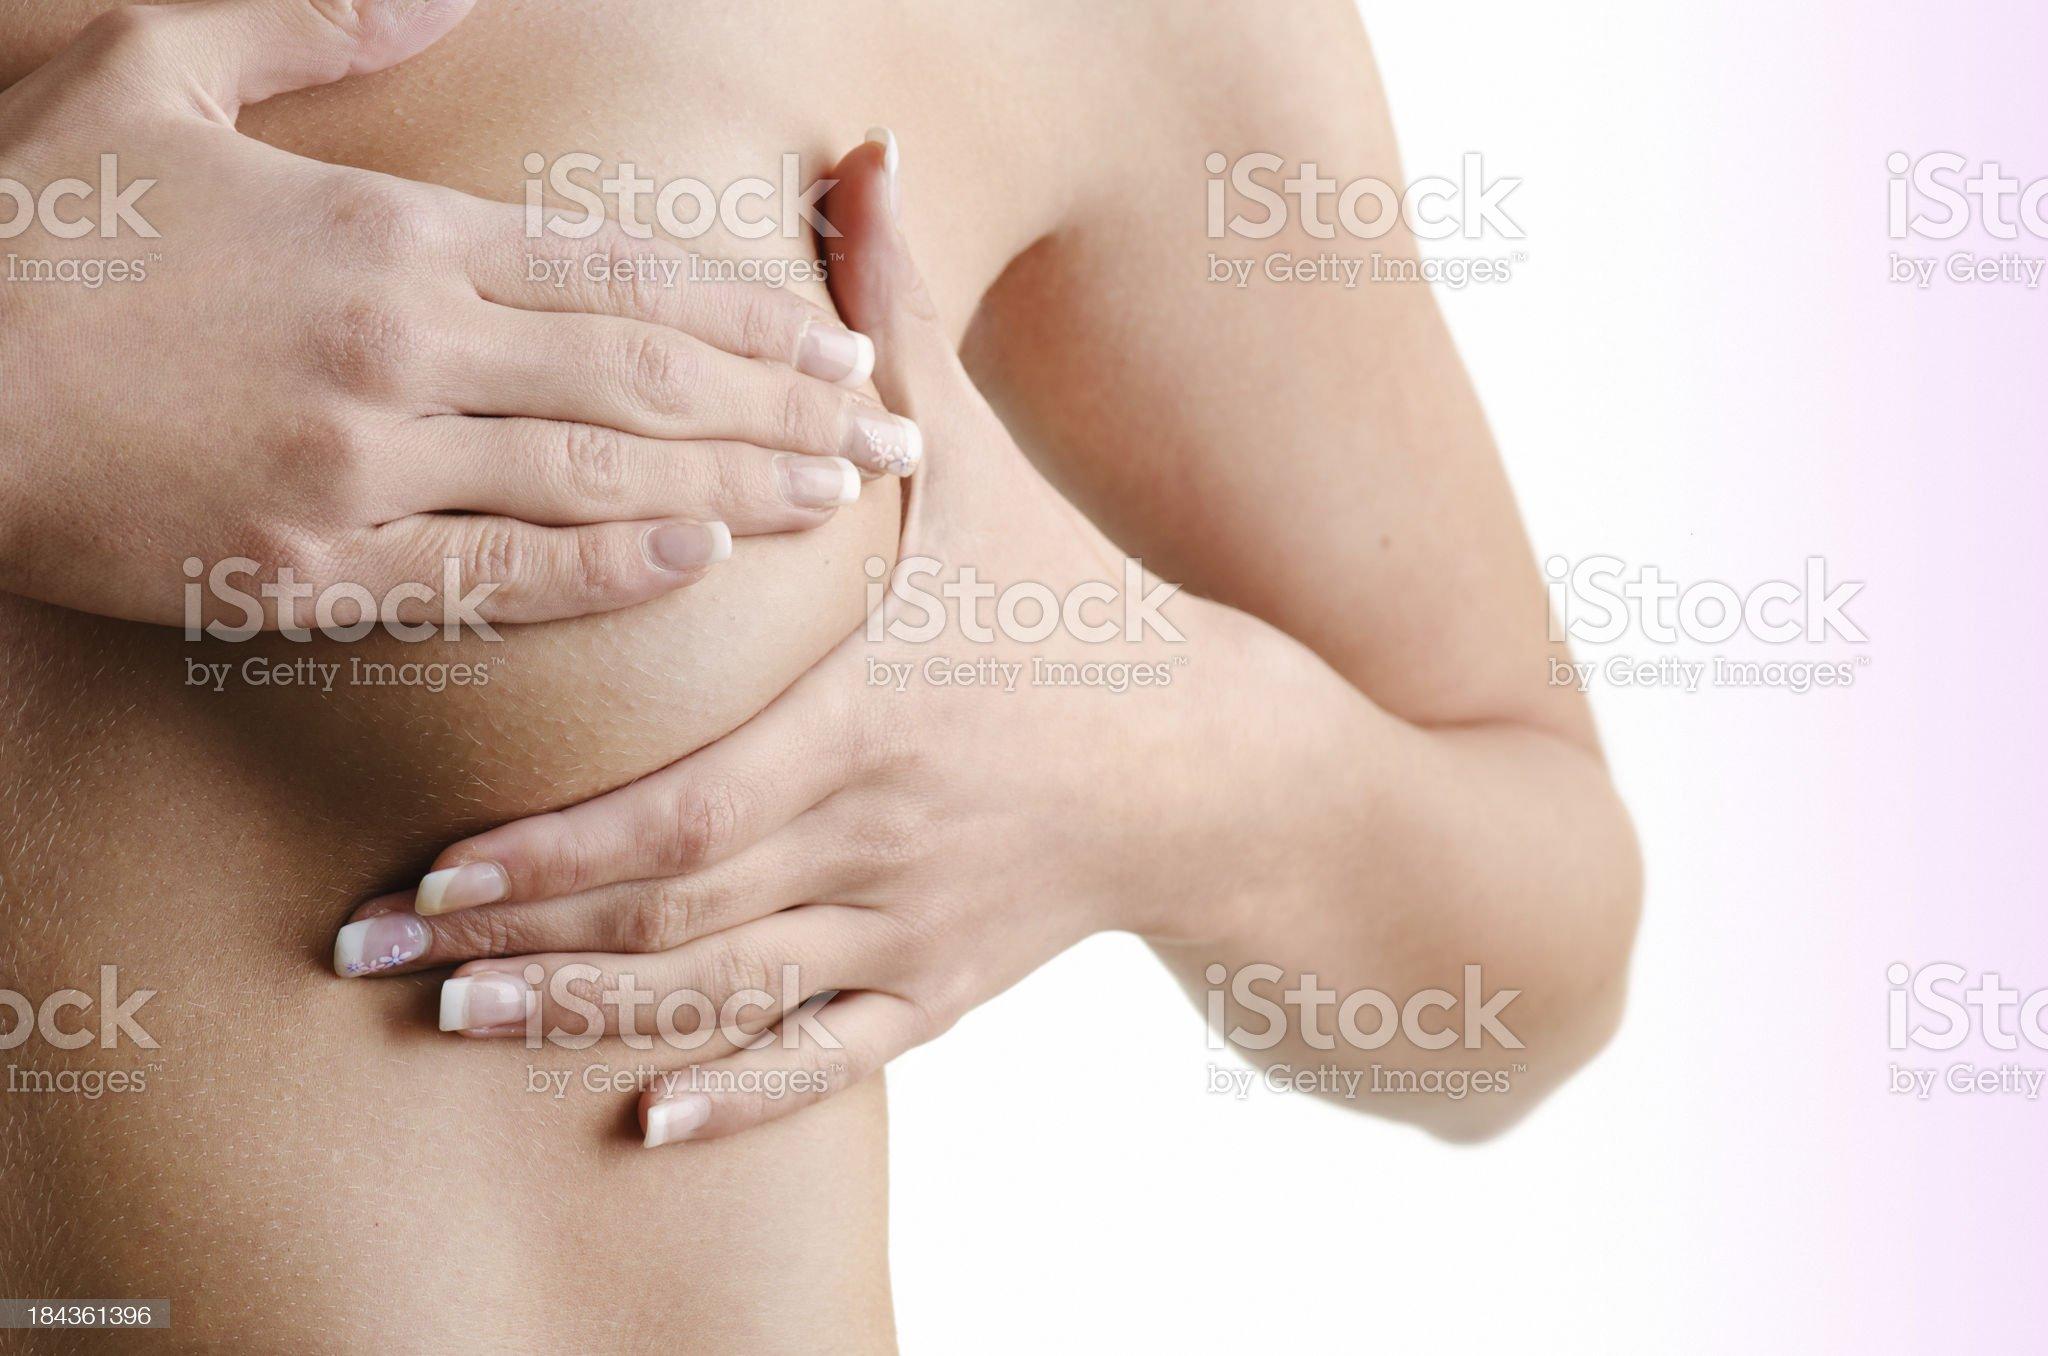 Breast cancer exam royalty-free stock photo